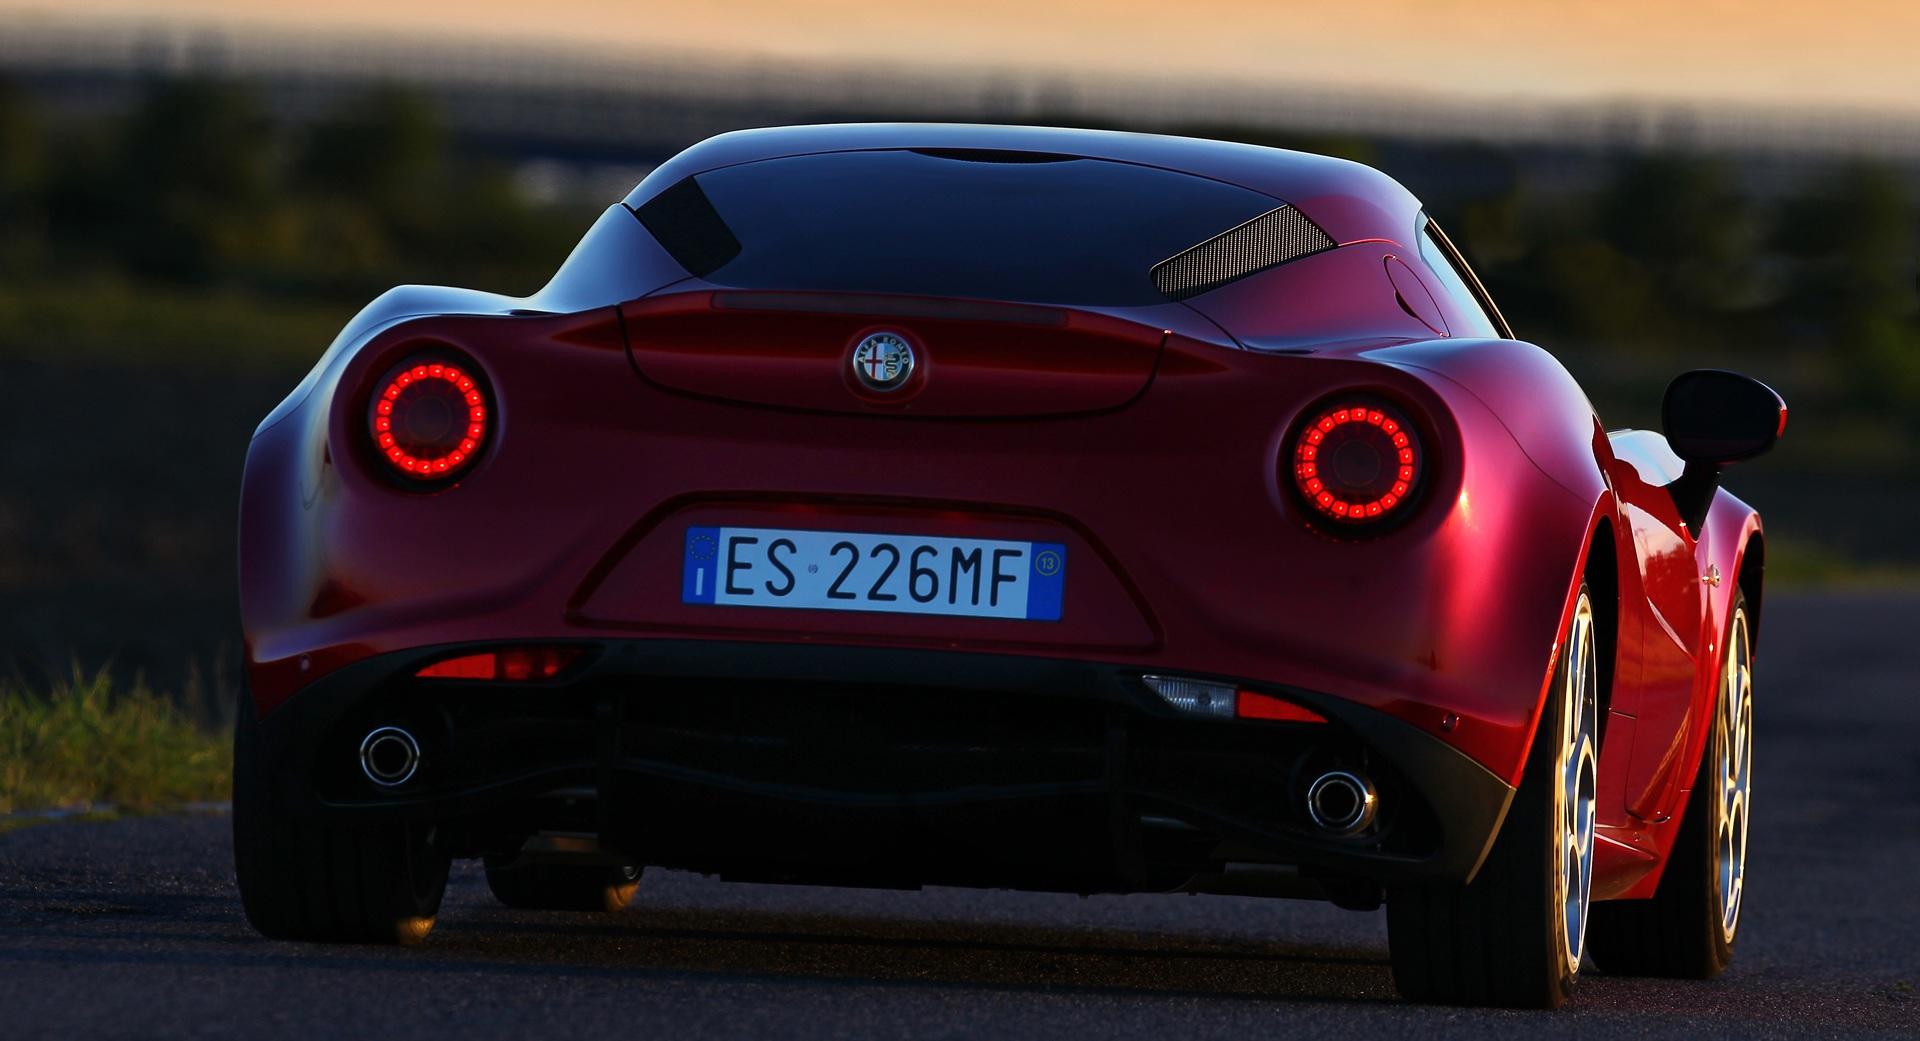 2014 Alfa Romeo 4C Rear View